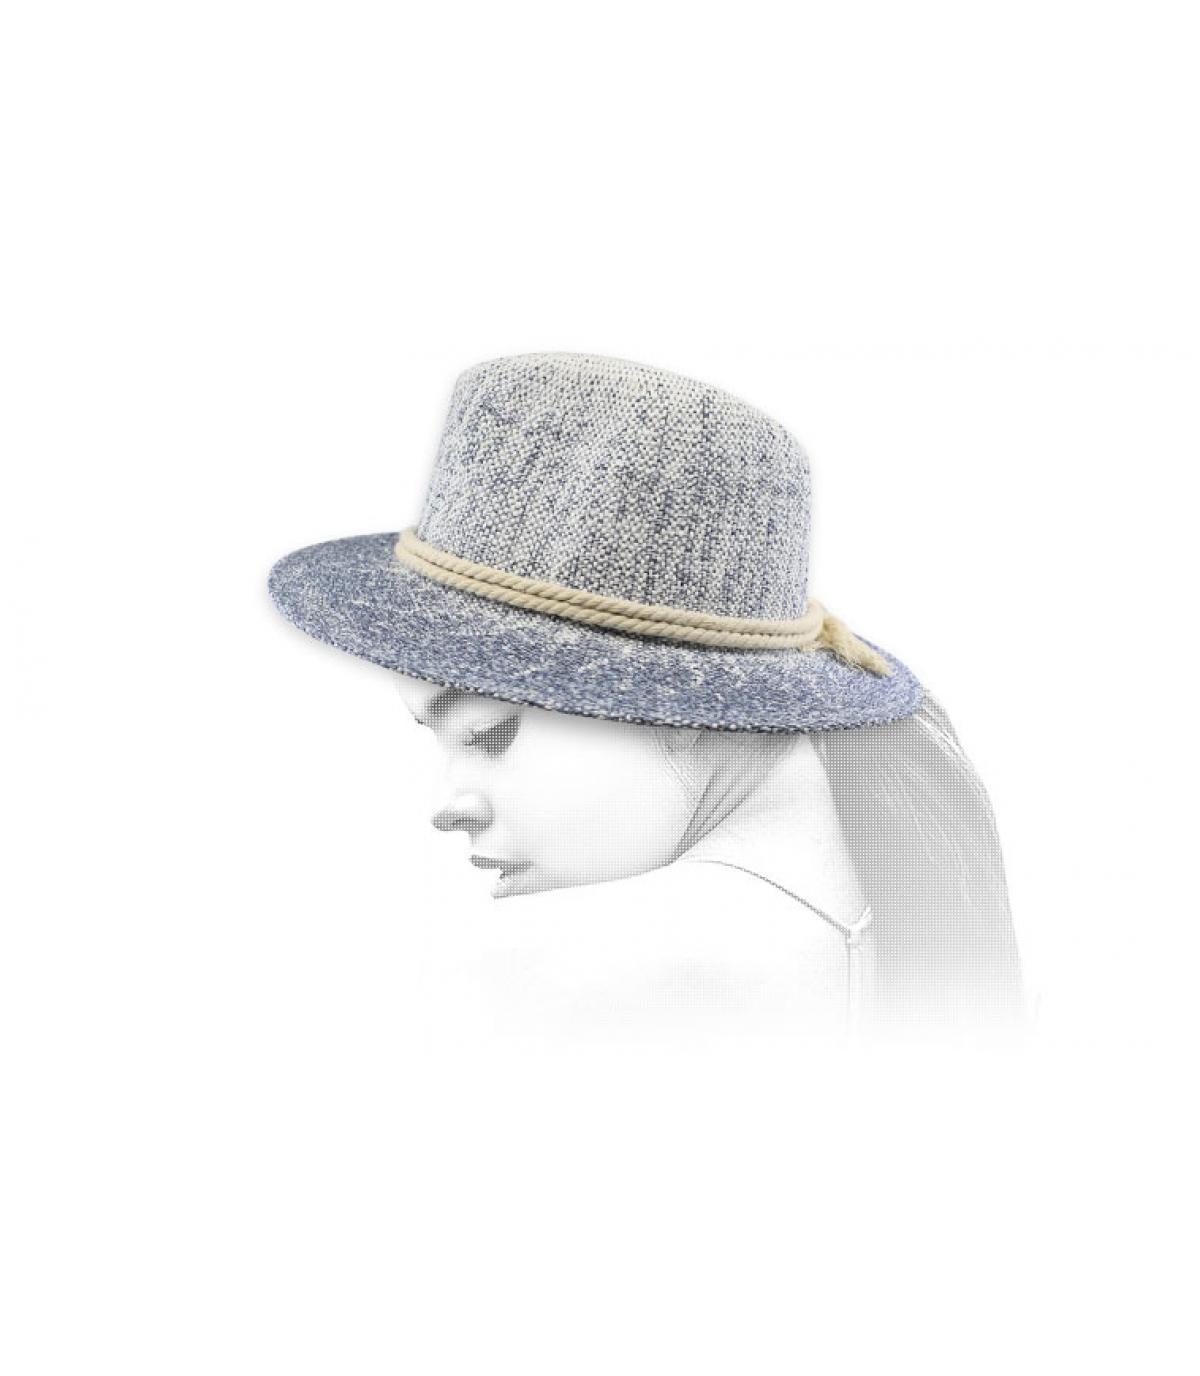 sombrero paja cuerda